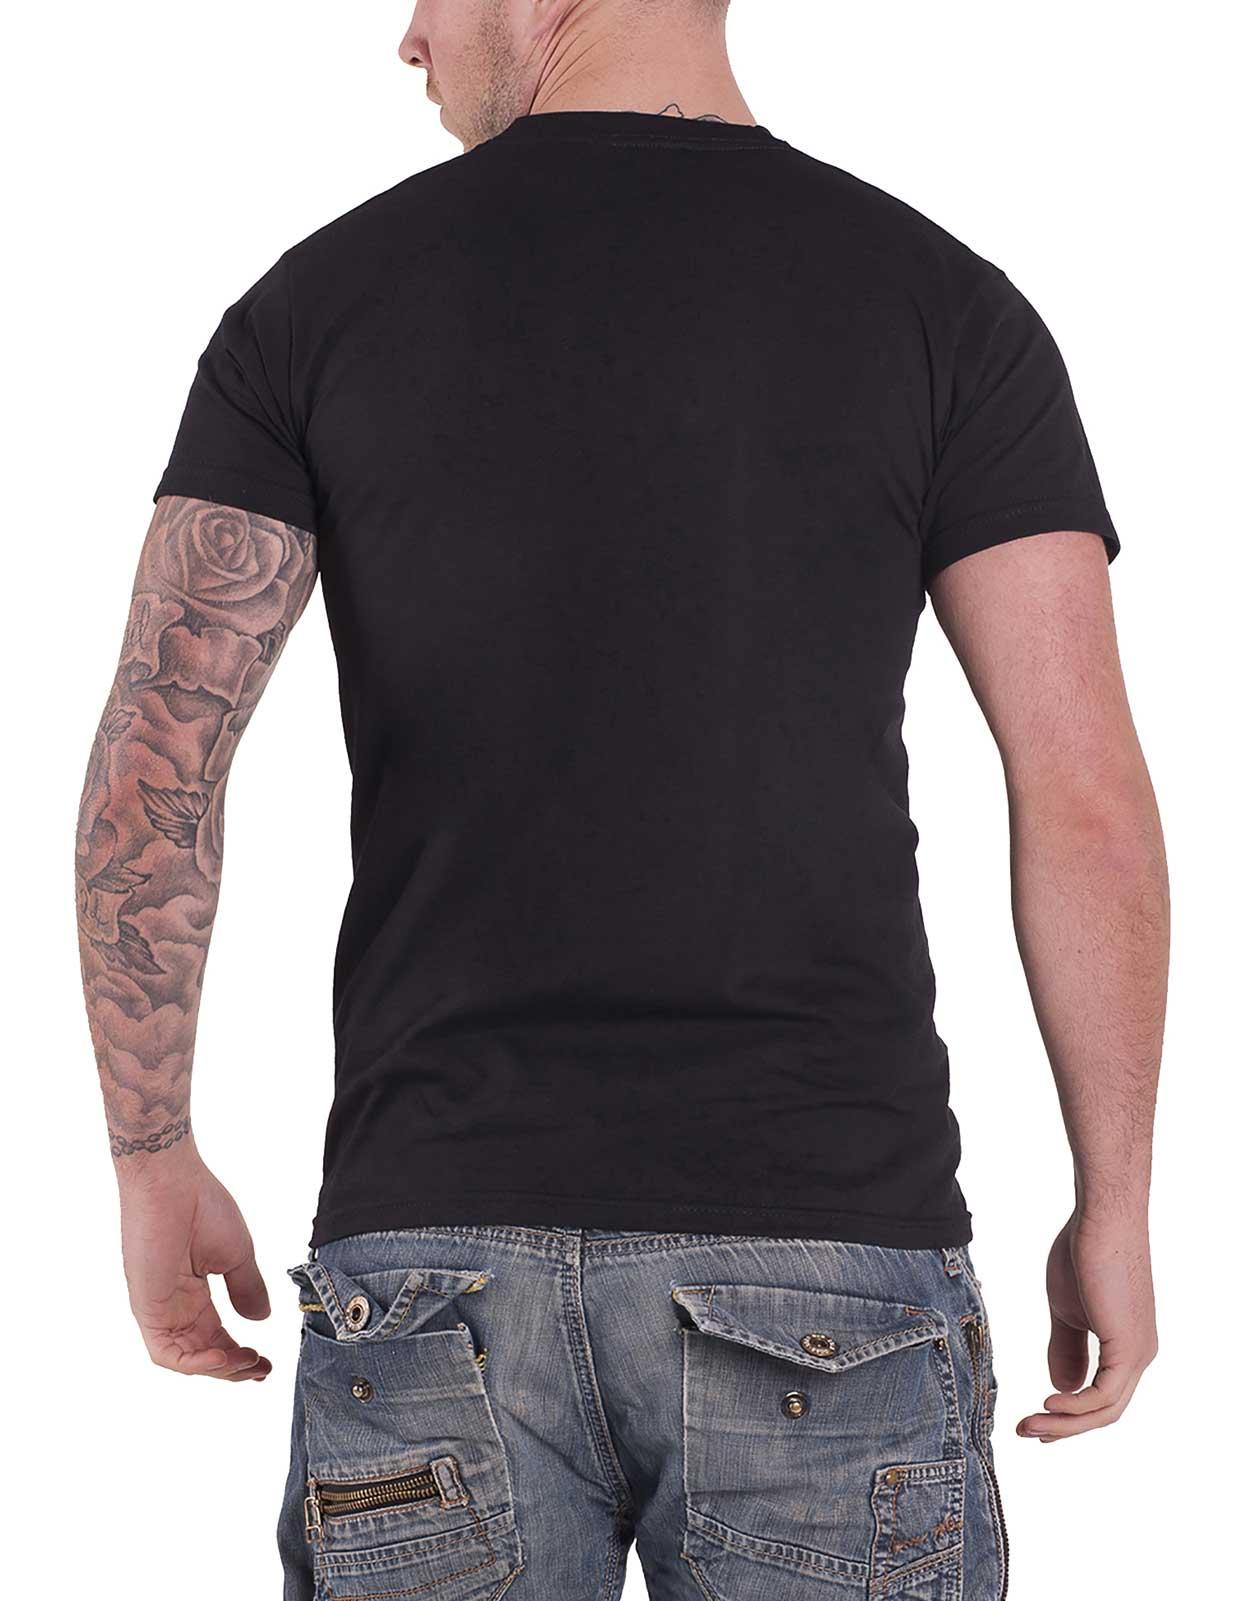 Officiel-Jimi-Hendrix-T-Shirt-Purple-Haze-Are-you-experienced-Logo-Homme-NEUF miniature 9